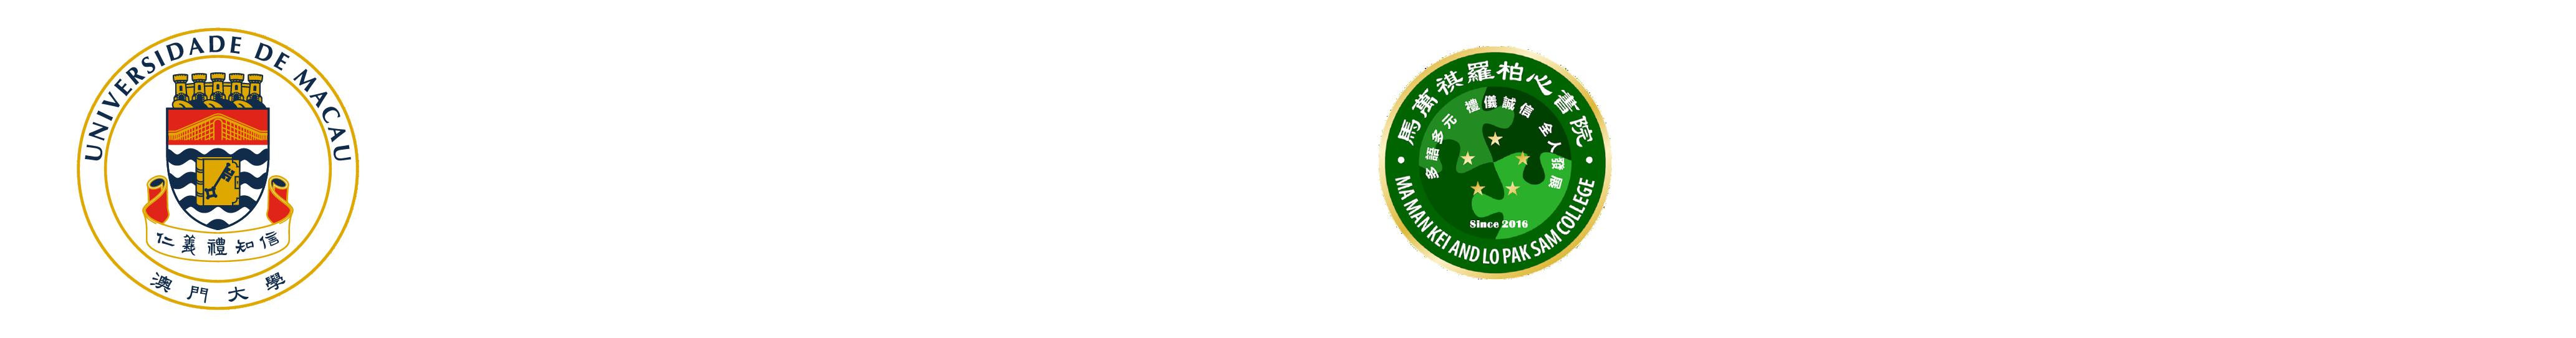 Ma Man Kei and Lo Pak Sam College | University of Macau Logo